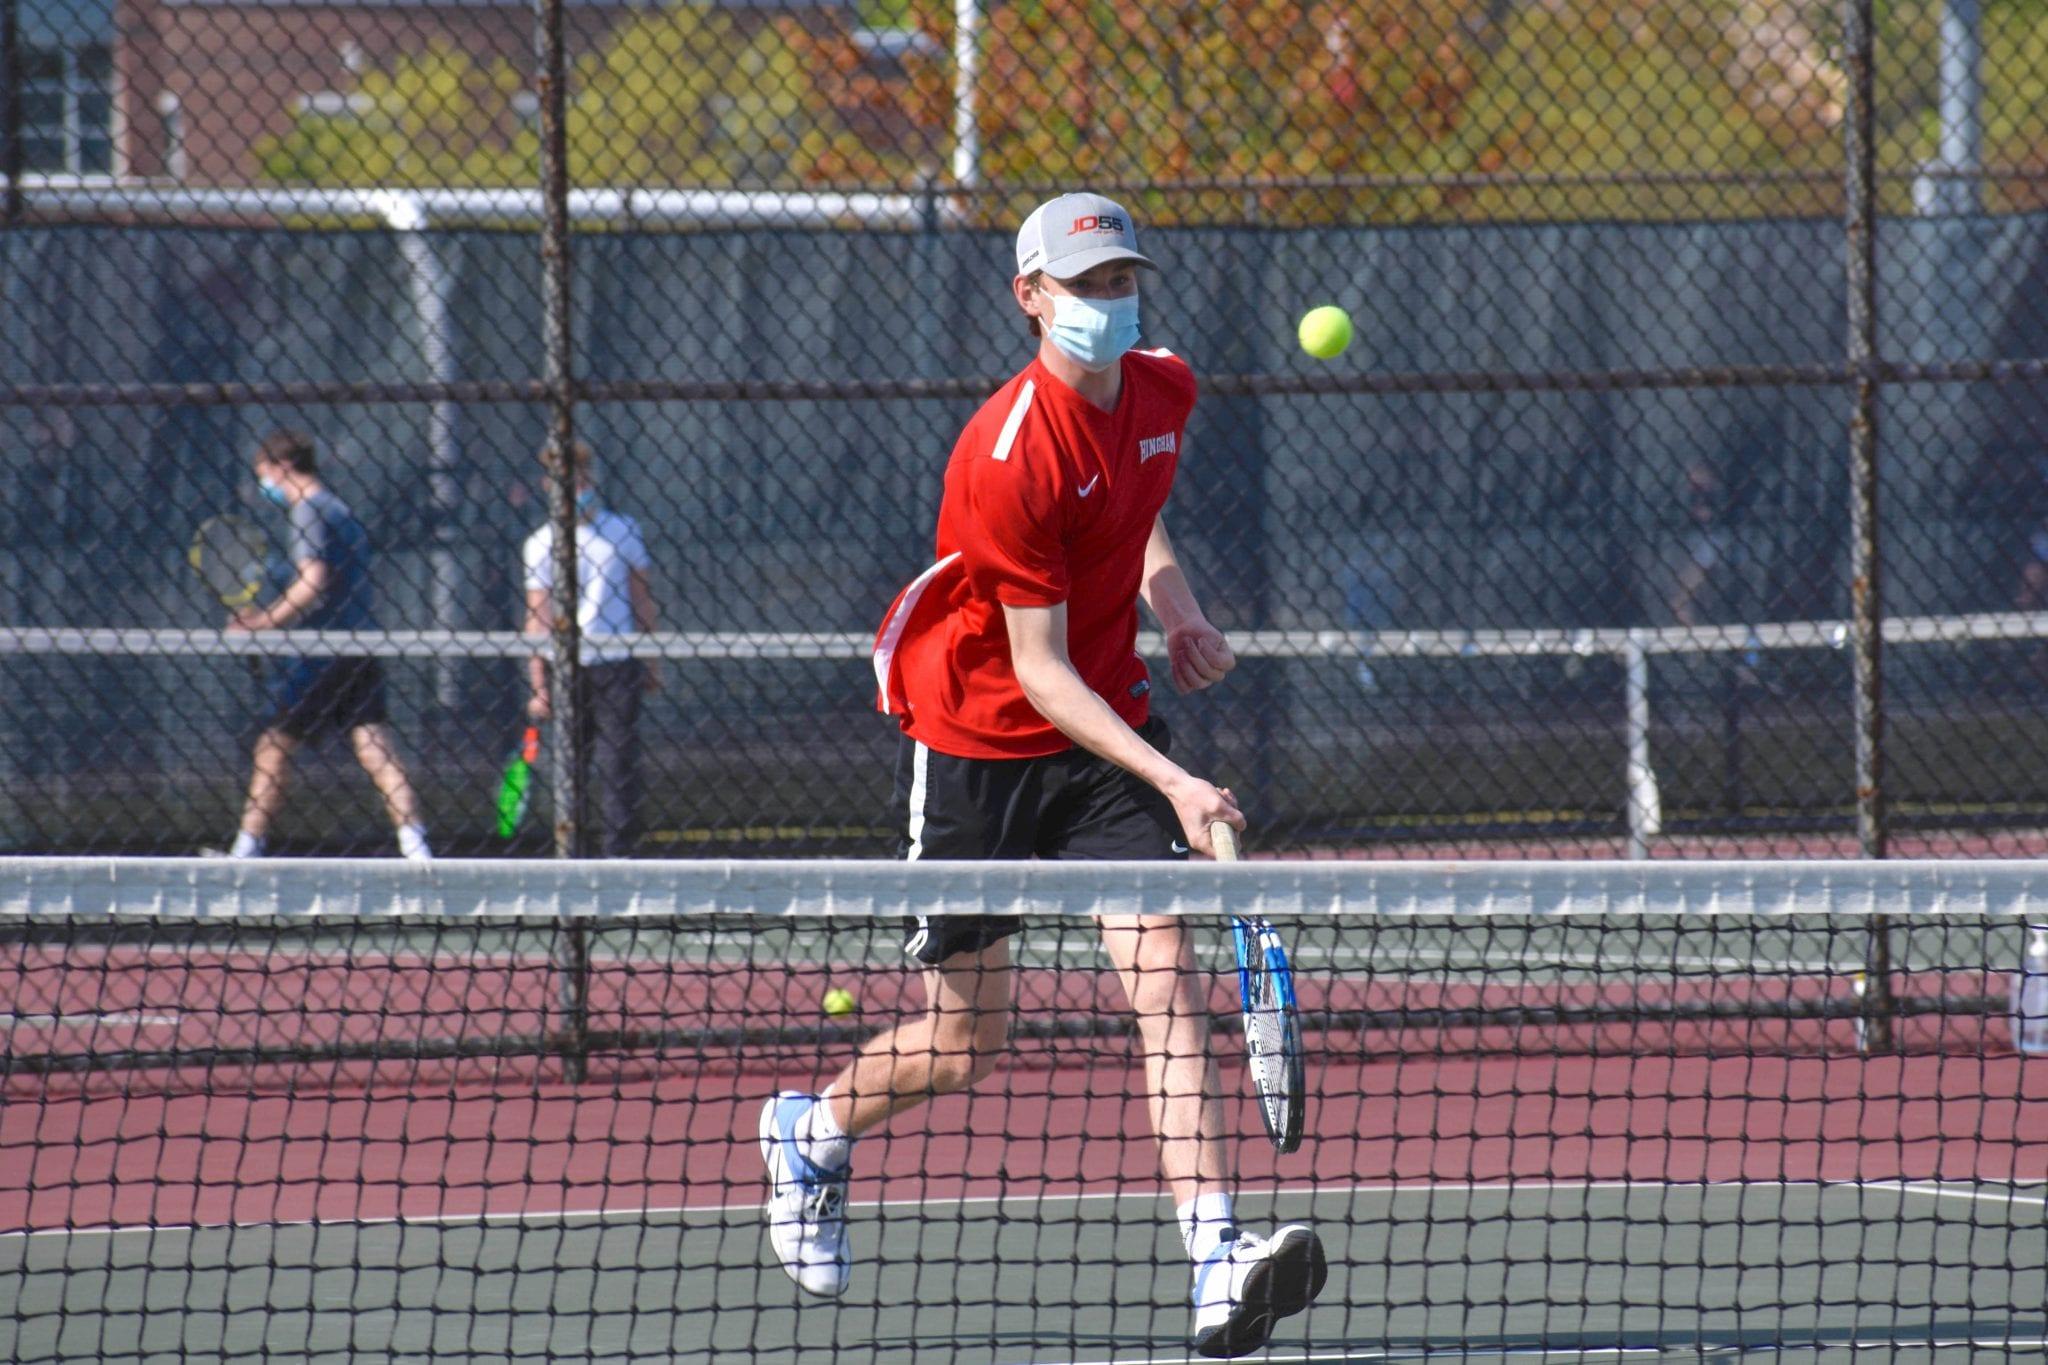 Sophomore Charlie Even meets a volley at the net. (Photo credit: Jake Bednarski)